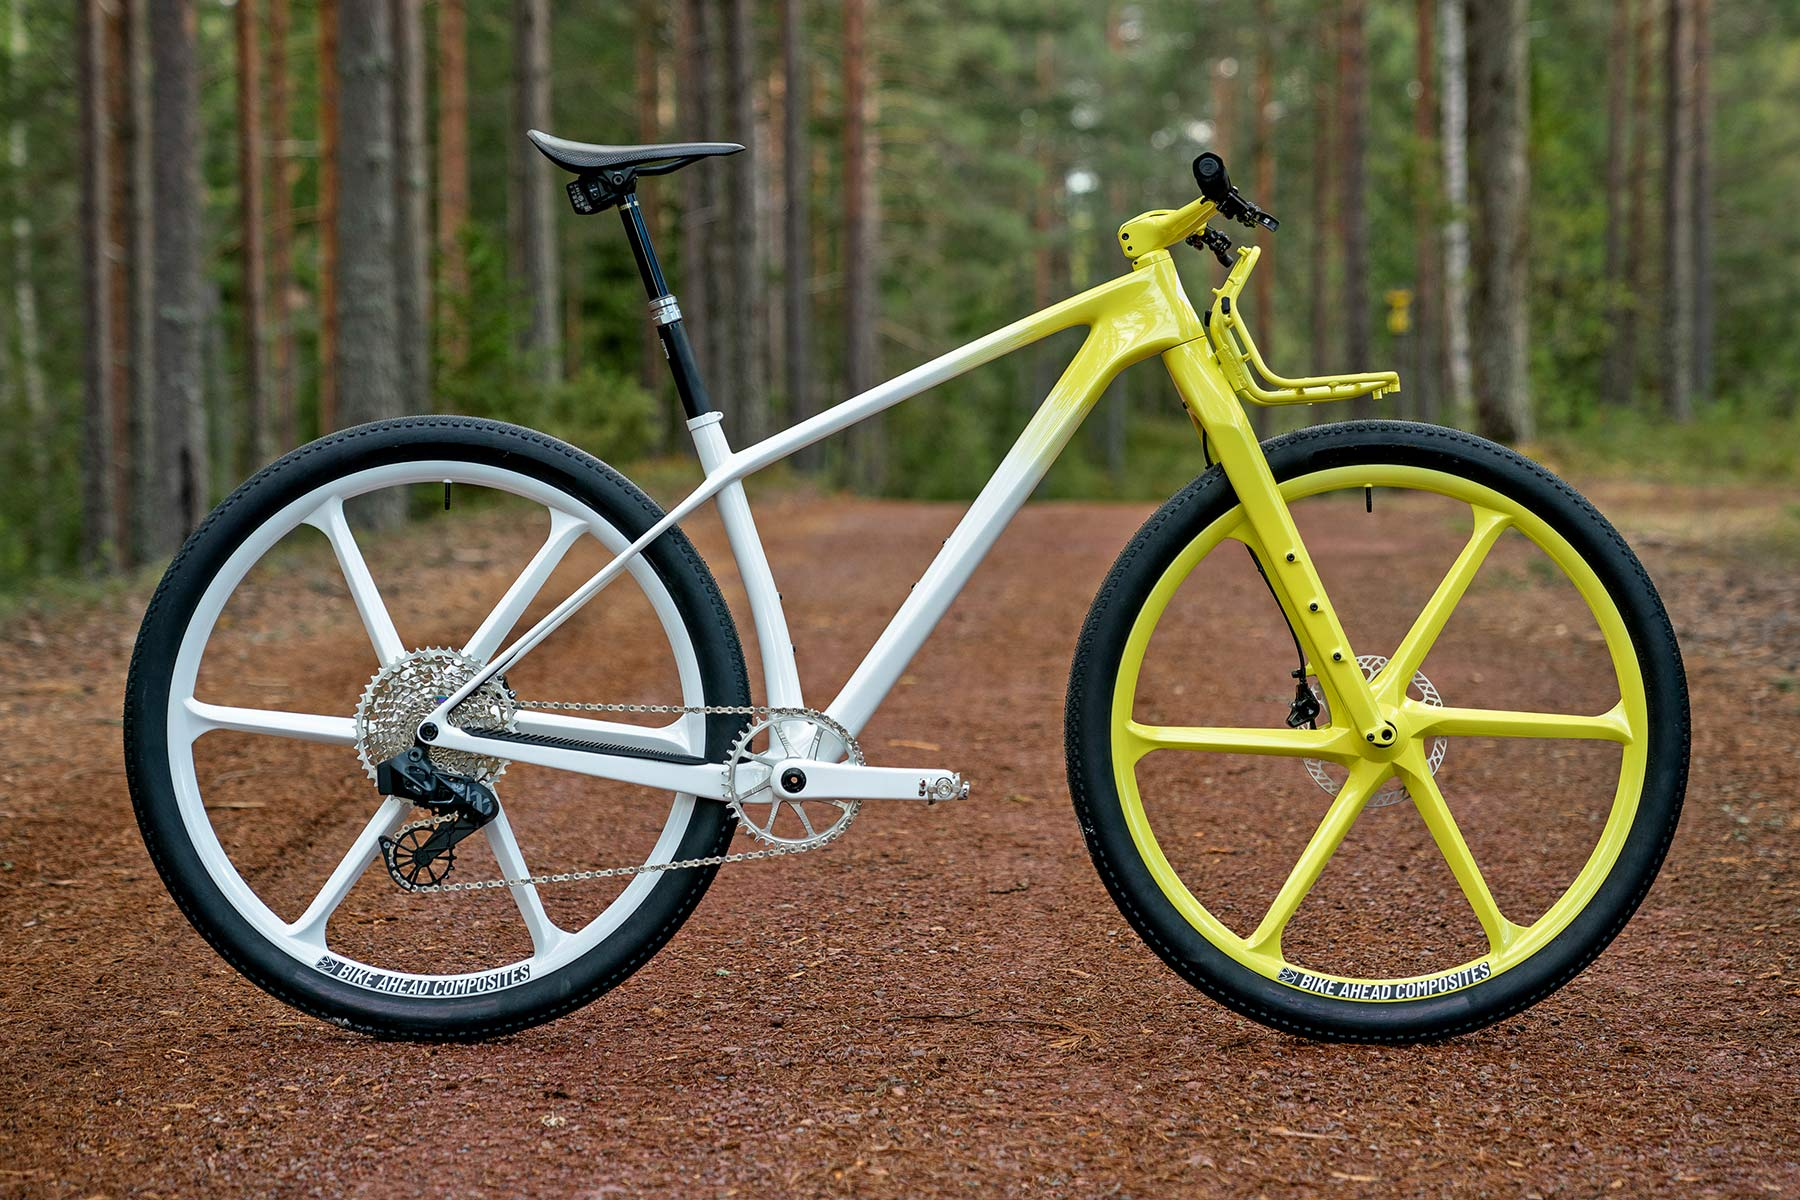 Dangerholm mellow yellow Scott Scale Gravel custom project bike, Gustav Gullholm dream bike builder, photo by Andreas Timfalt,complete